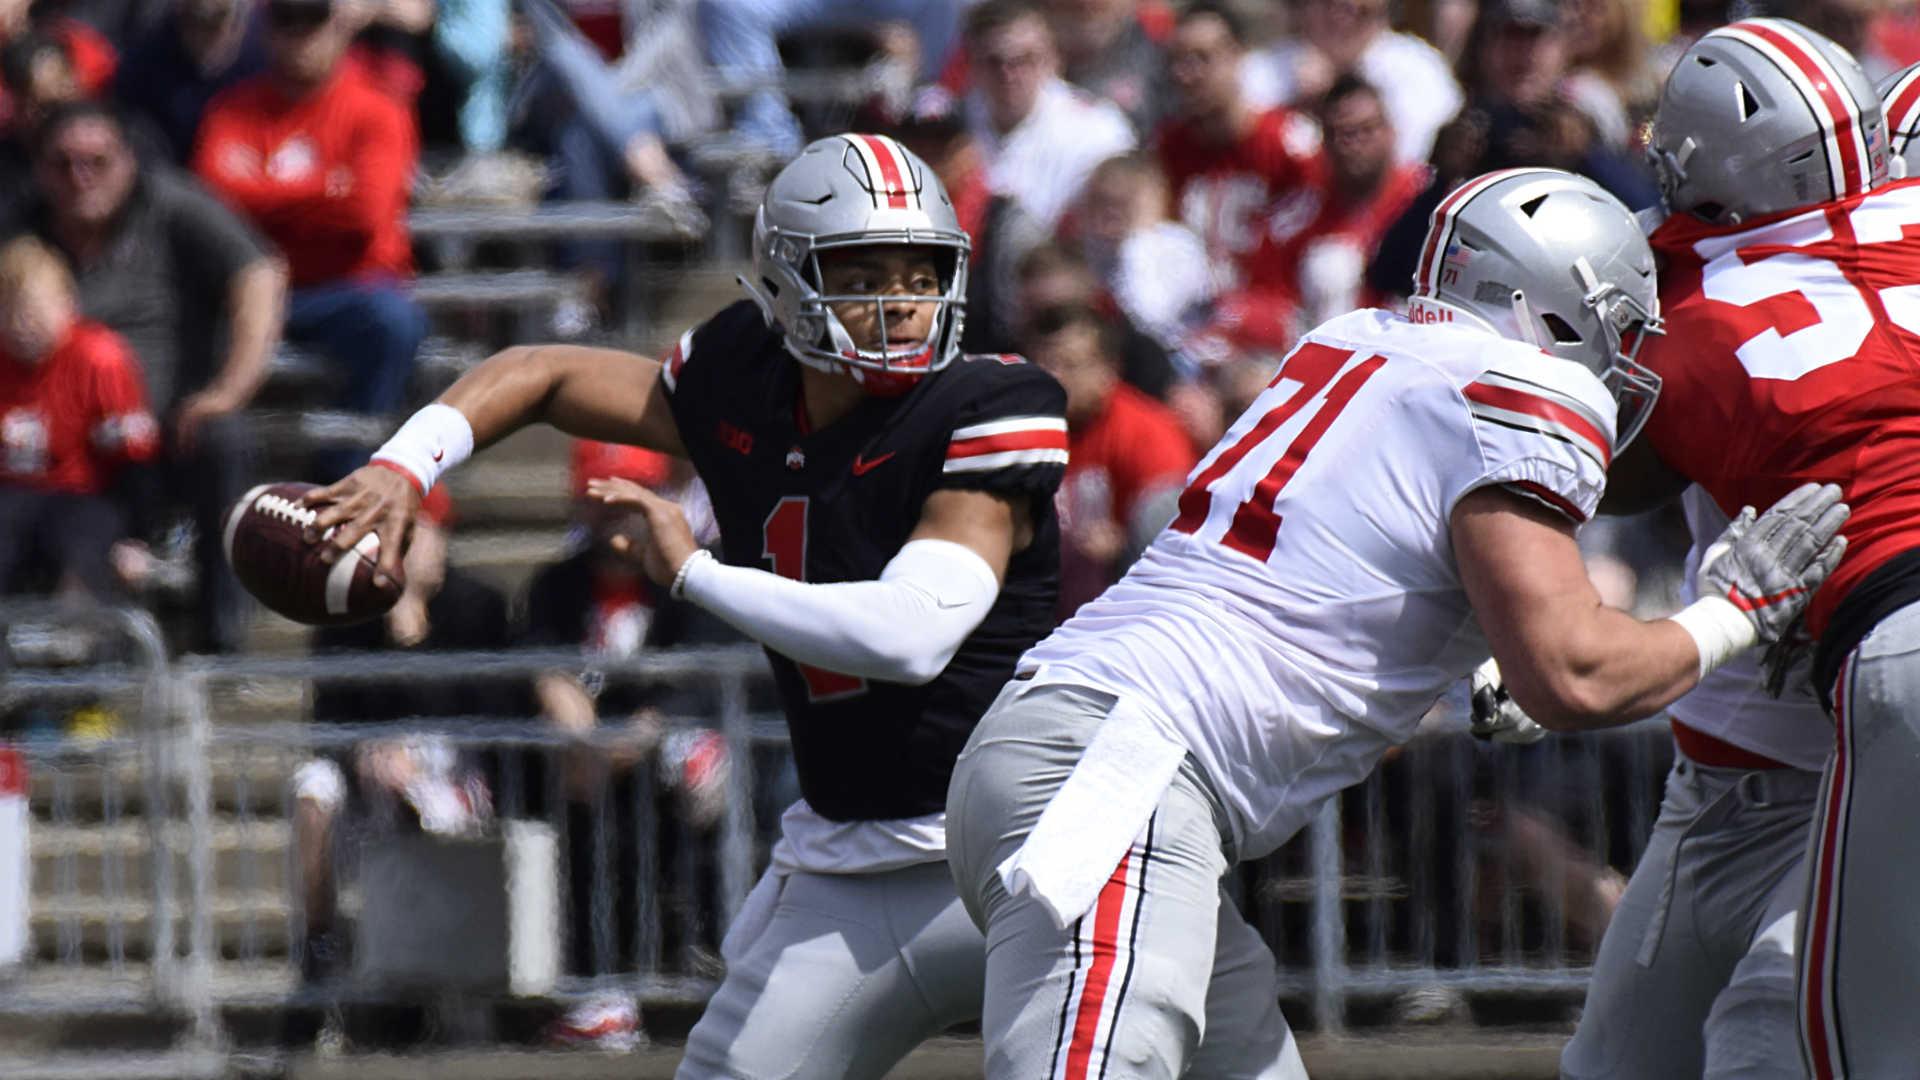 College football Week 1 primer: Heisman Watch, upset picks